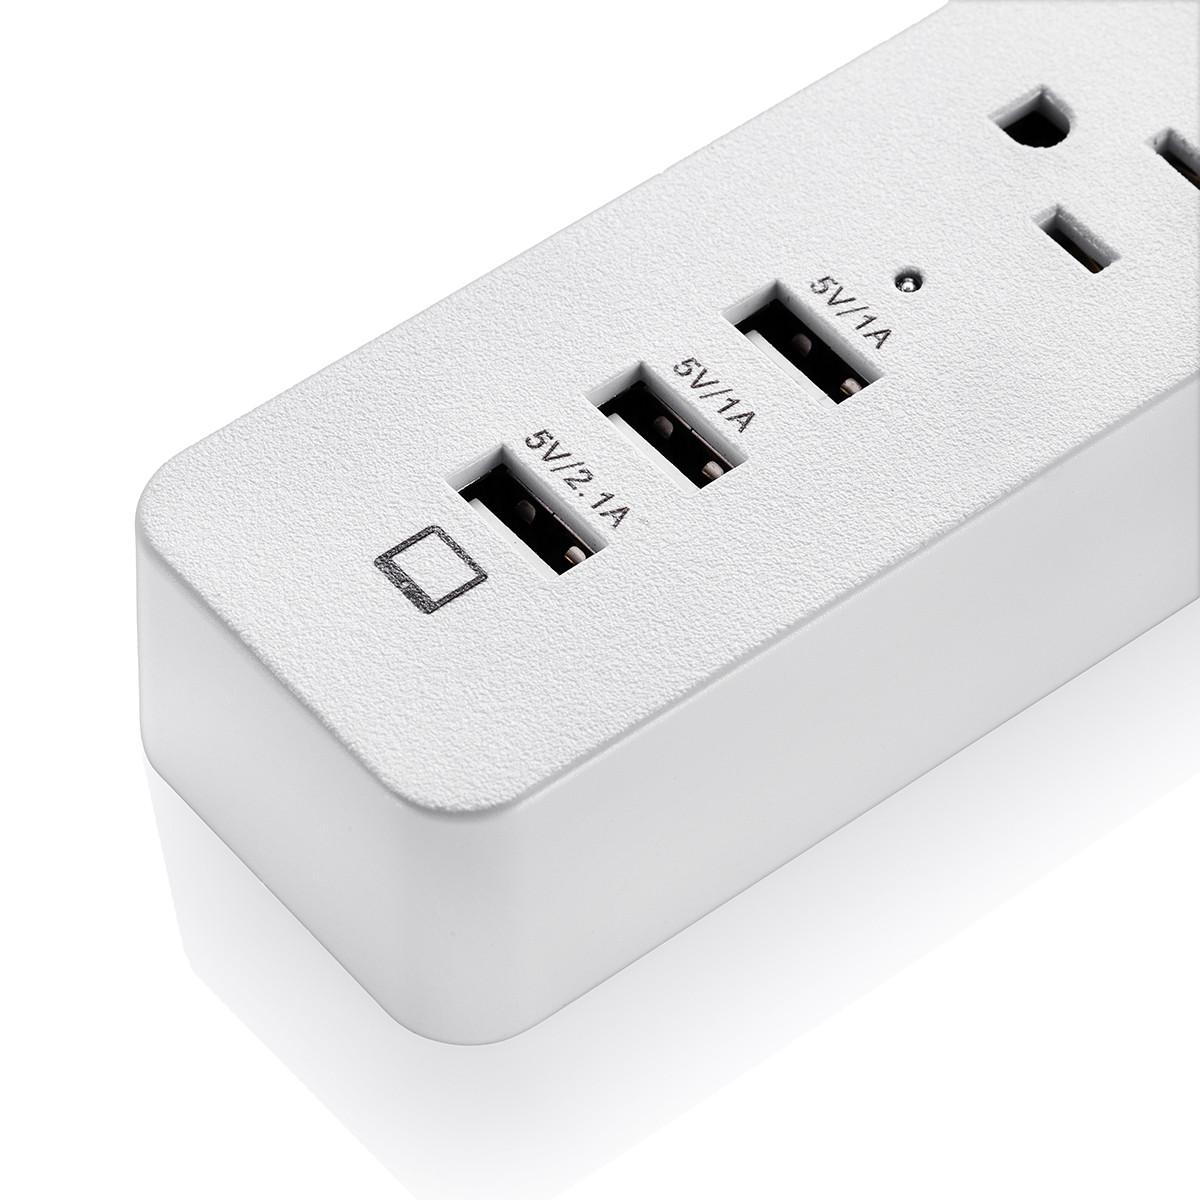 3 outlets surge protector power strip with 3 usb charging ports lightningproof ebay. Black Bedroom Furniture Sets. Home Design Ideas